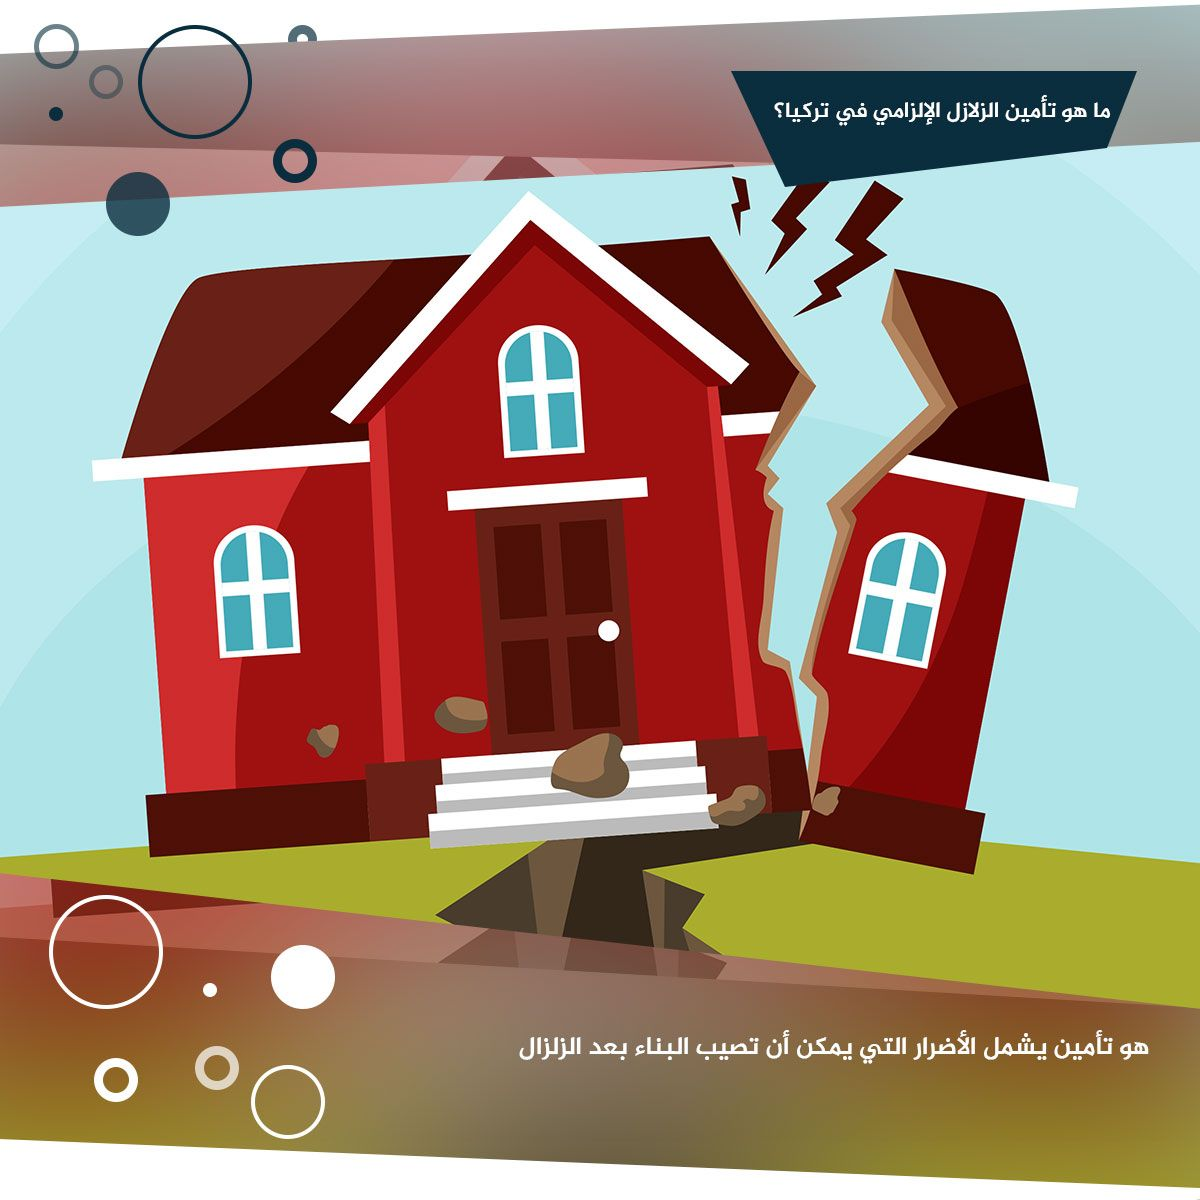 معلومات هامة حول تأمين الزلازل في تركيا Family Guy Earthquake Fictional Characters